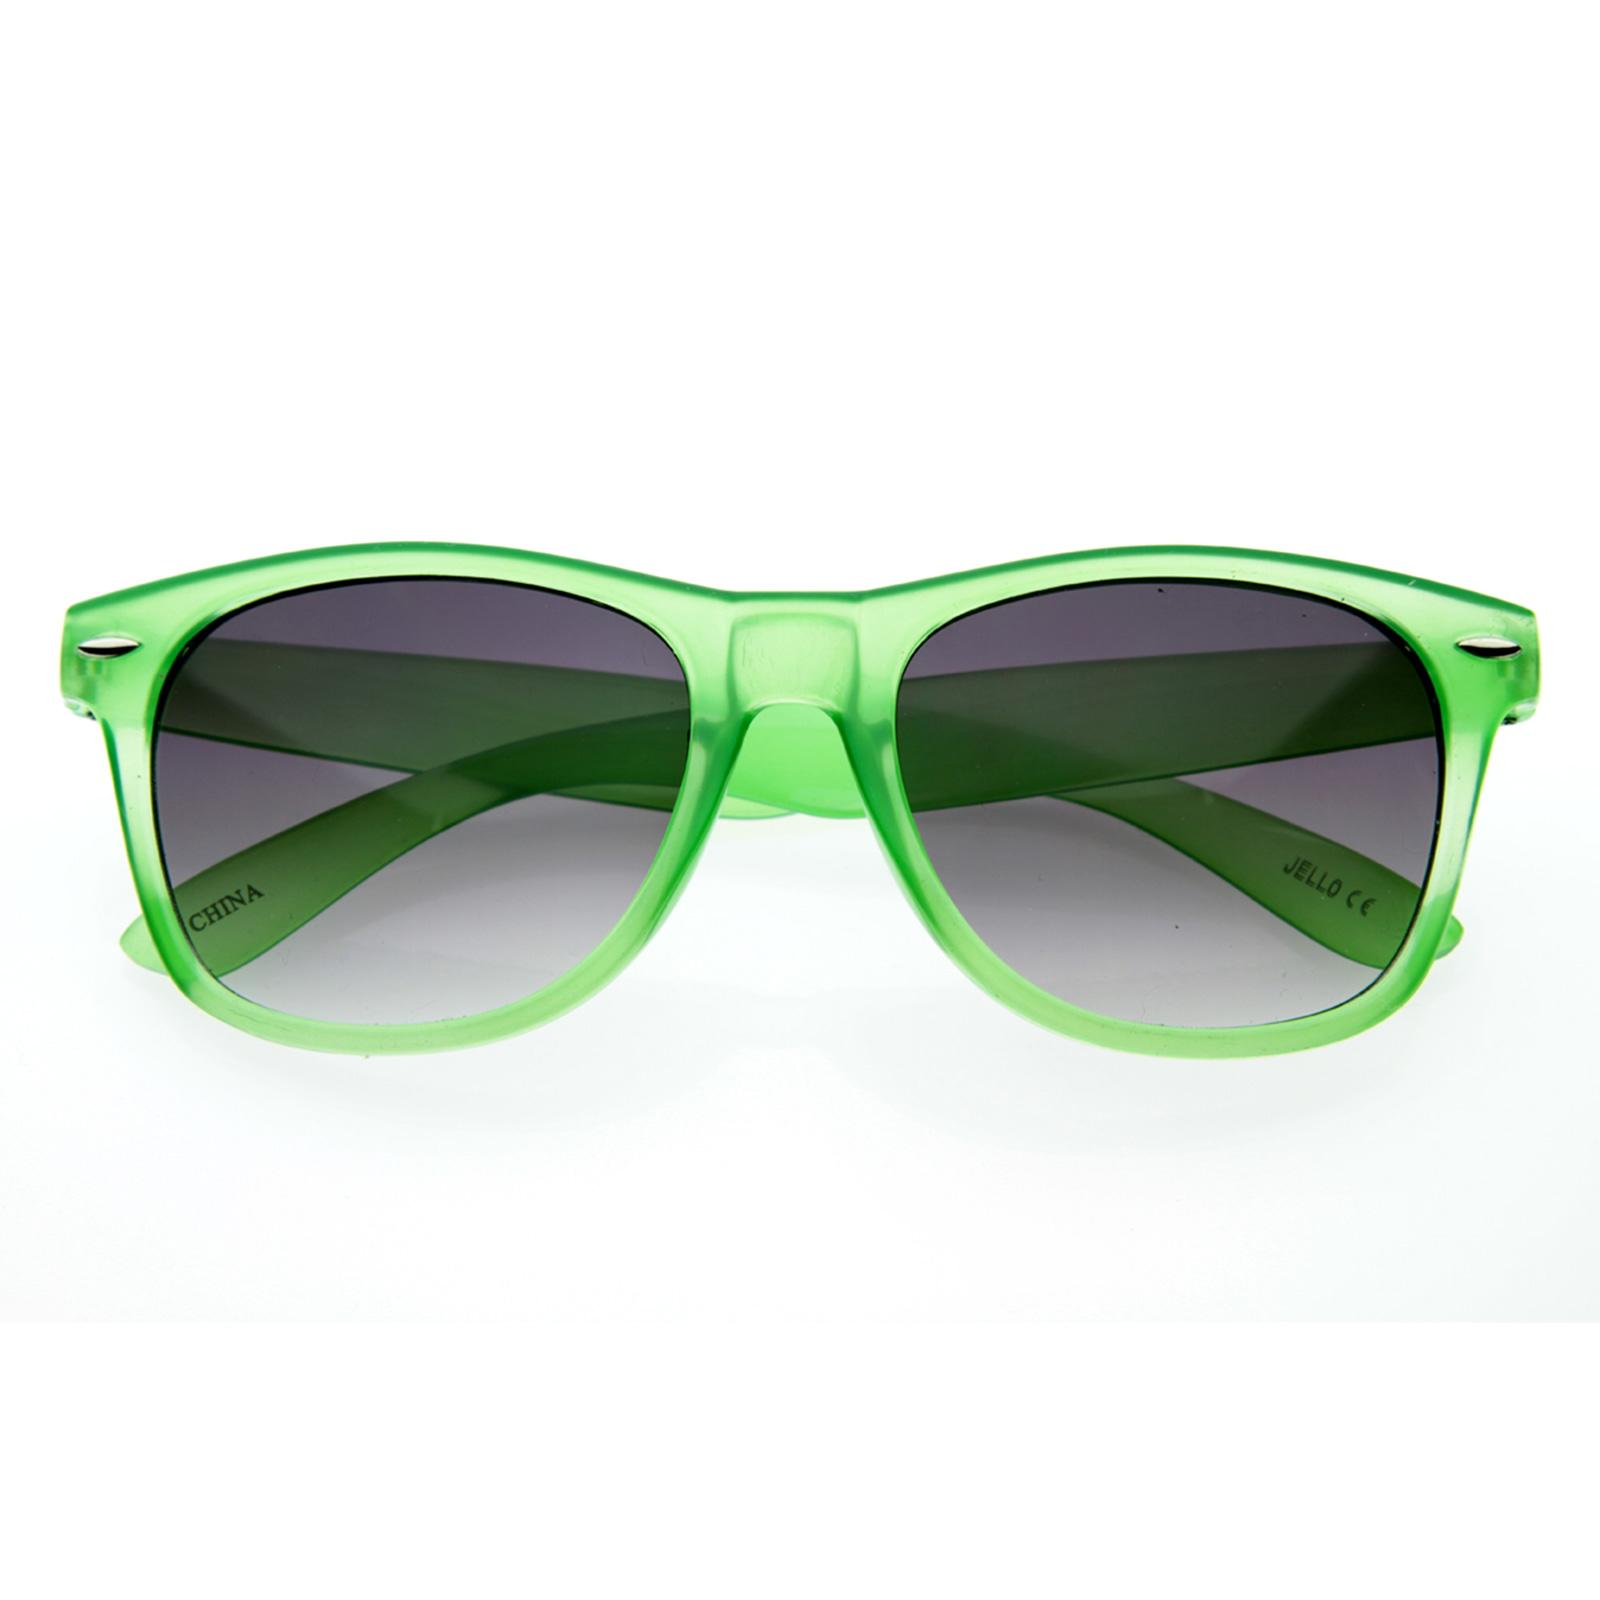 Jello-Candy-Color-Bright-Colorful-Transparent-Shades-Sunglasses-2978-Pouch